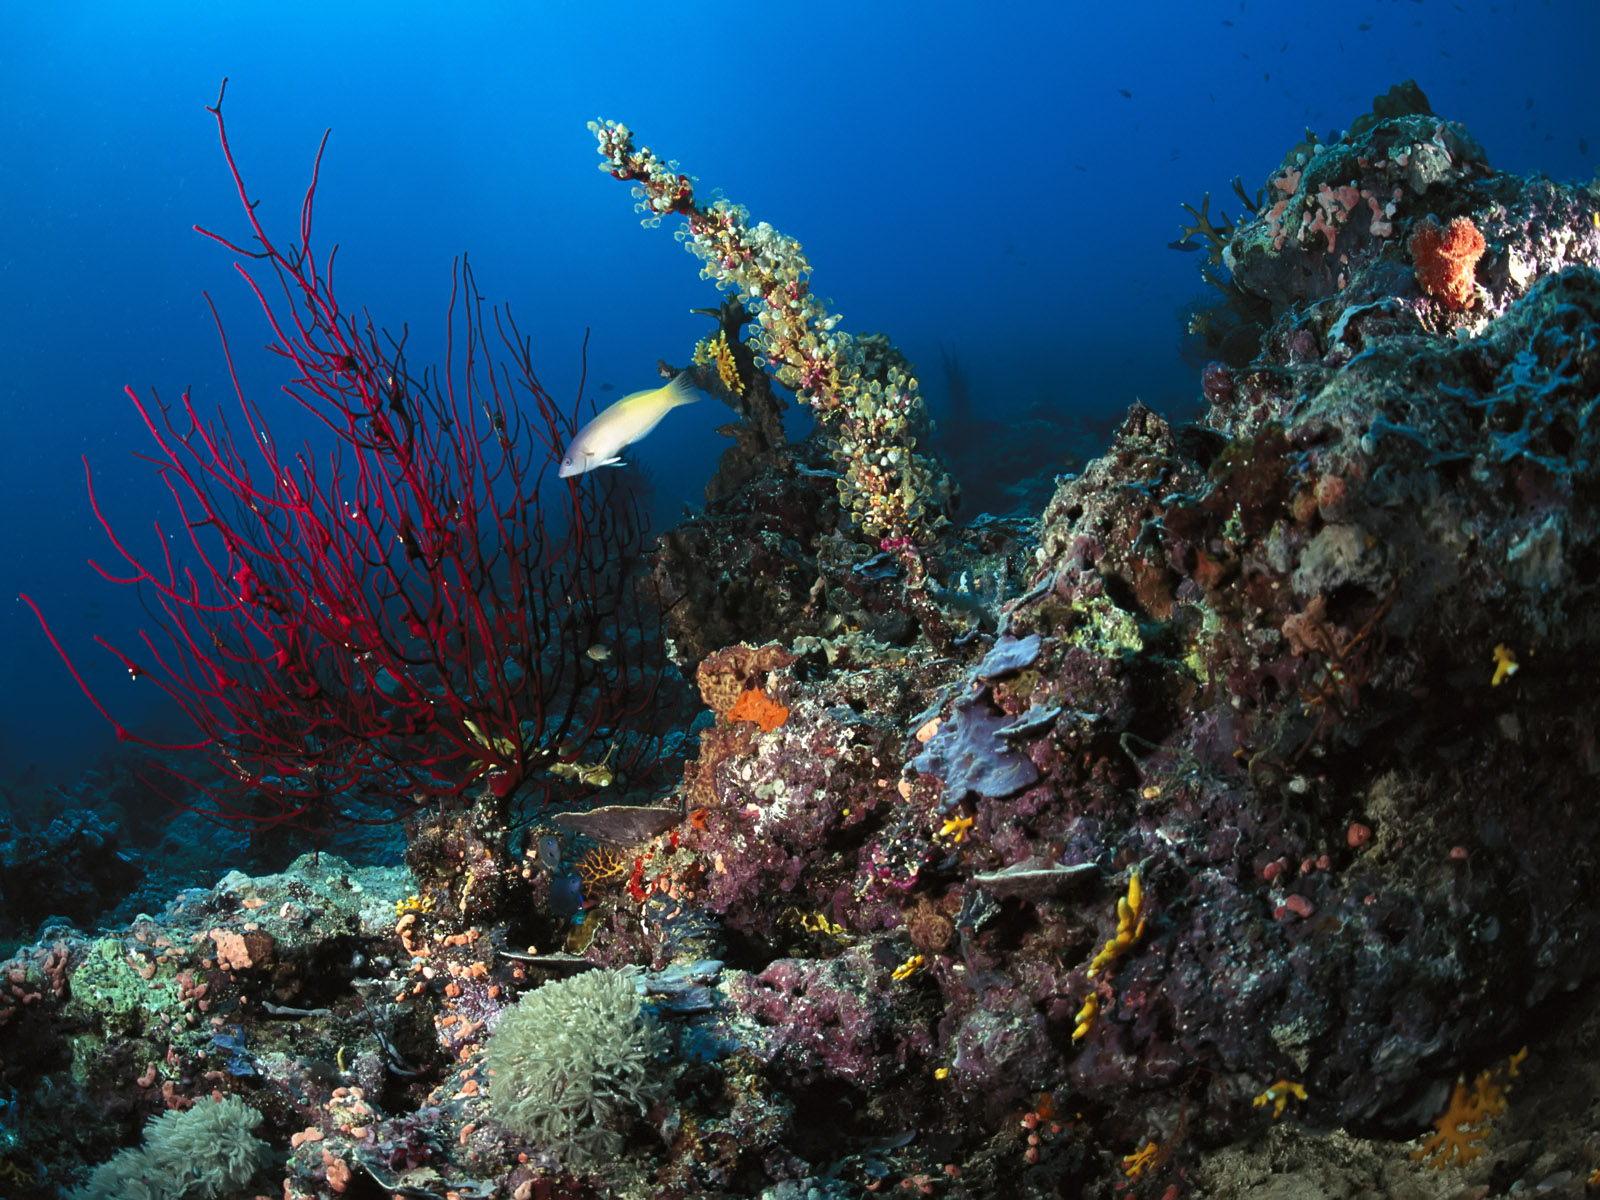 http://4.bp.blogspot.com/_sRGU_JXOz6E/TRYOcwEKqKI/AAAAAAAAAes/06k0SfSL4rU/s1600/Underwater%2BLandscapes%2B%2BWallpaper%2B%25252879%252529.jpg